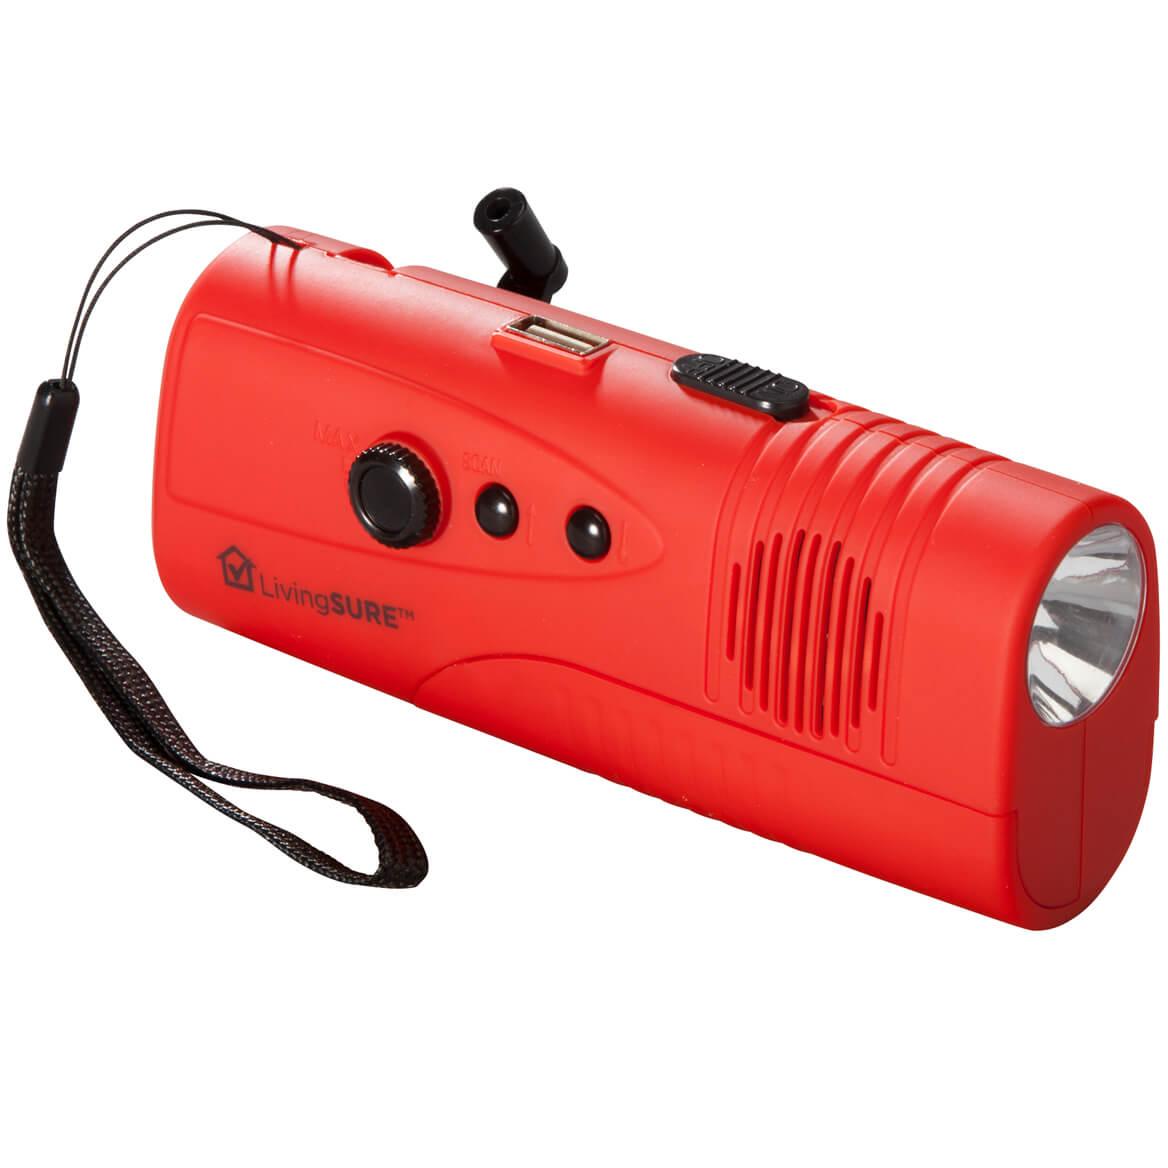 LivingSURE™ Emergency Flashlight Radio Deluxe